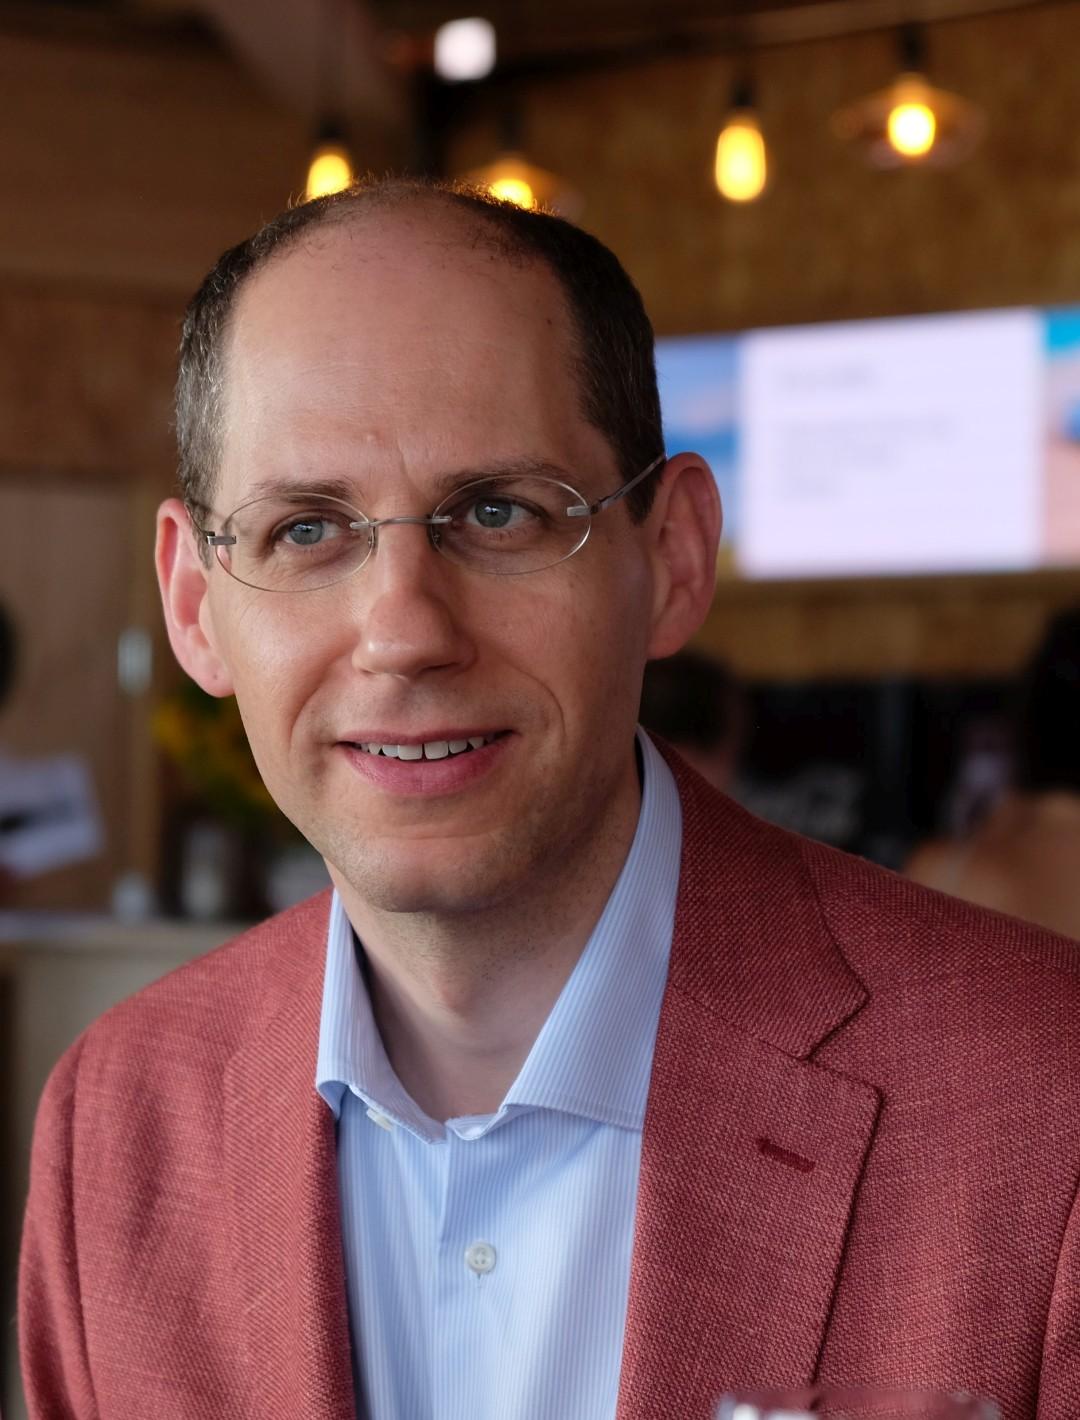 Daniel ChappuisVevey